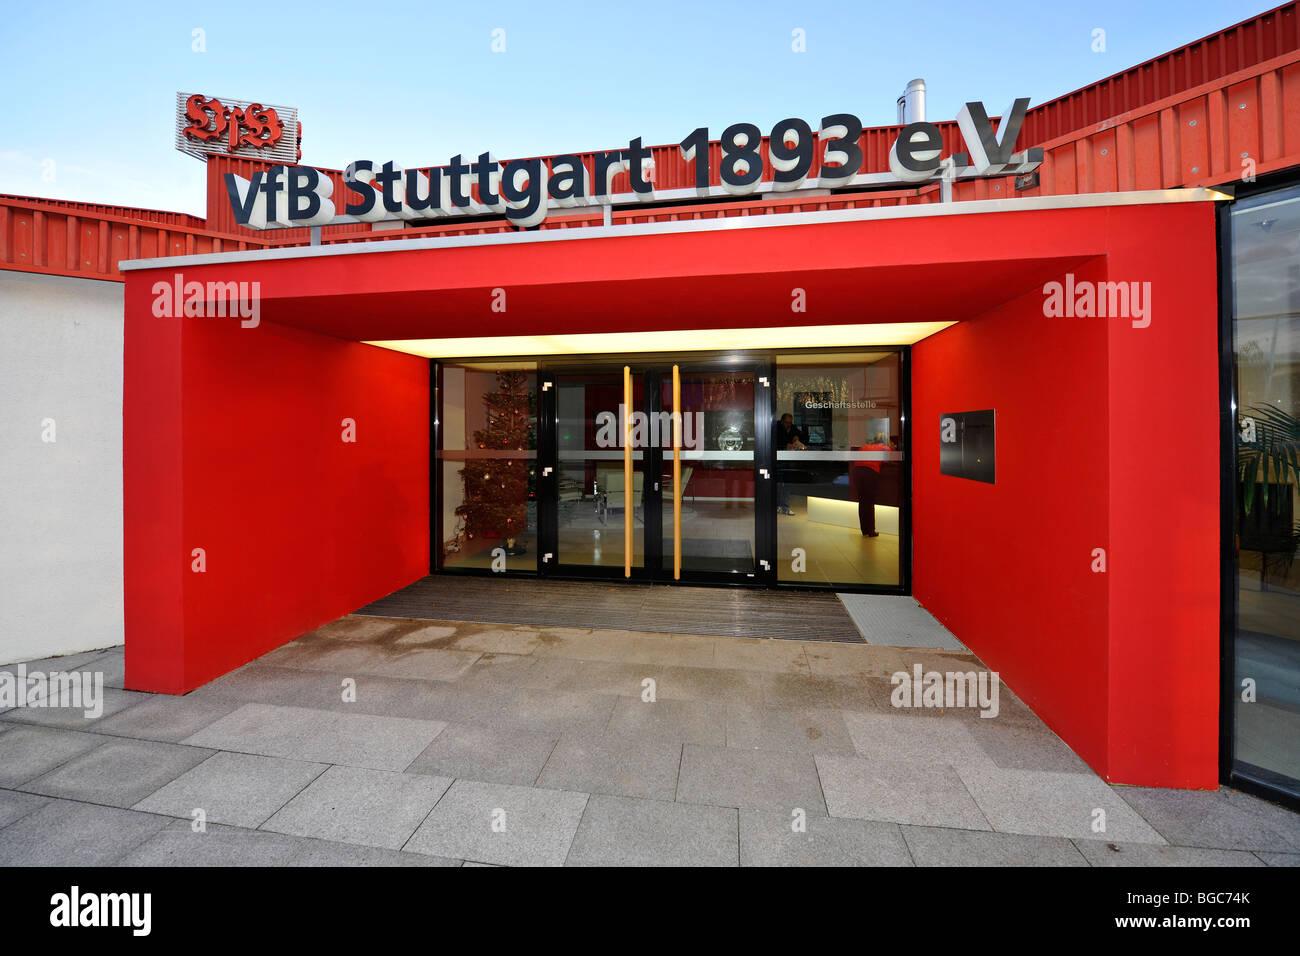 Www.Vfb Stuttgart.De Transfergerüchte